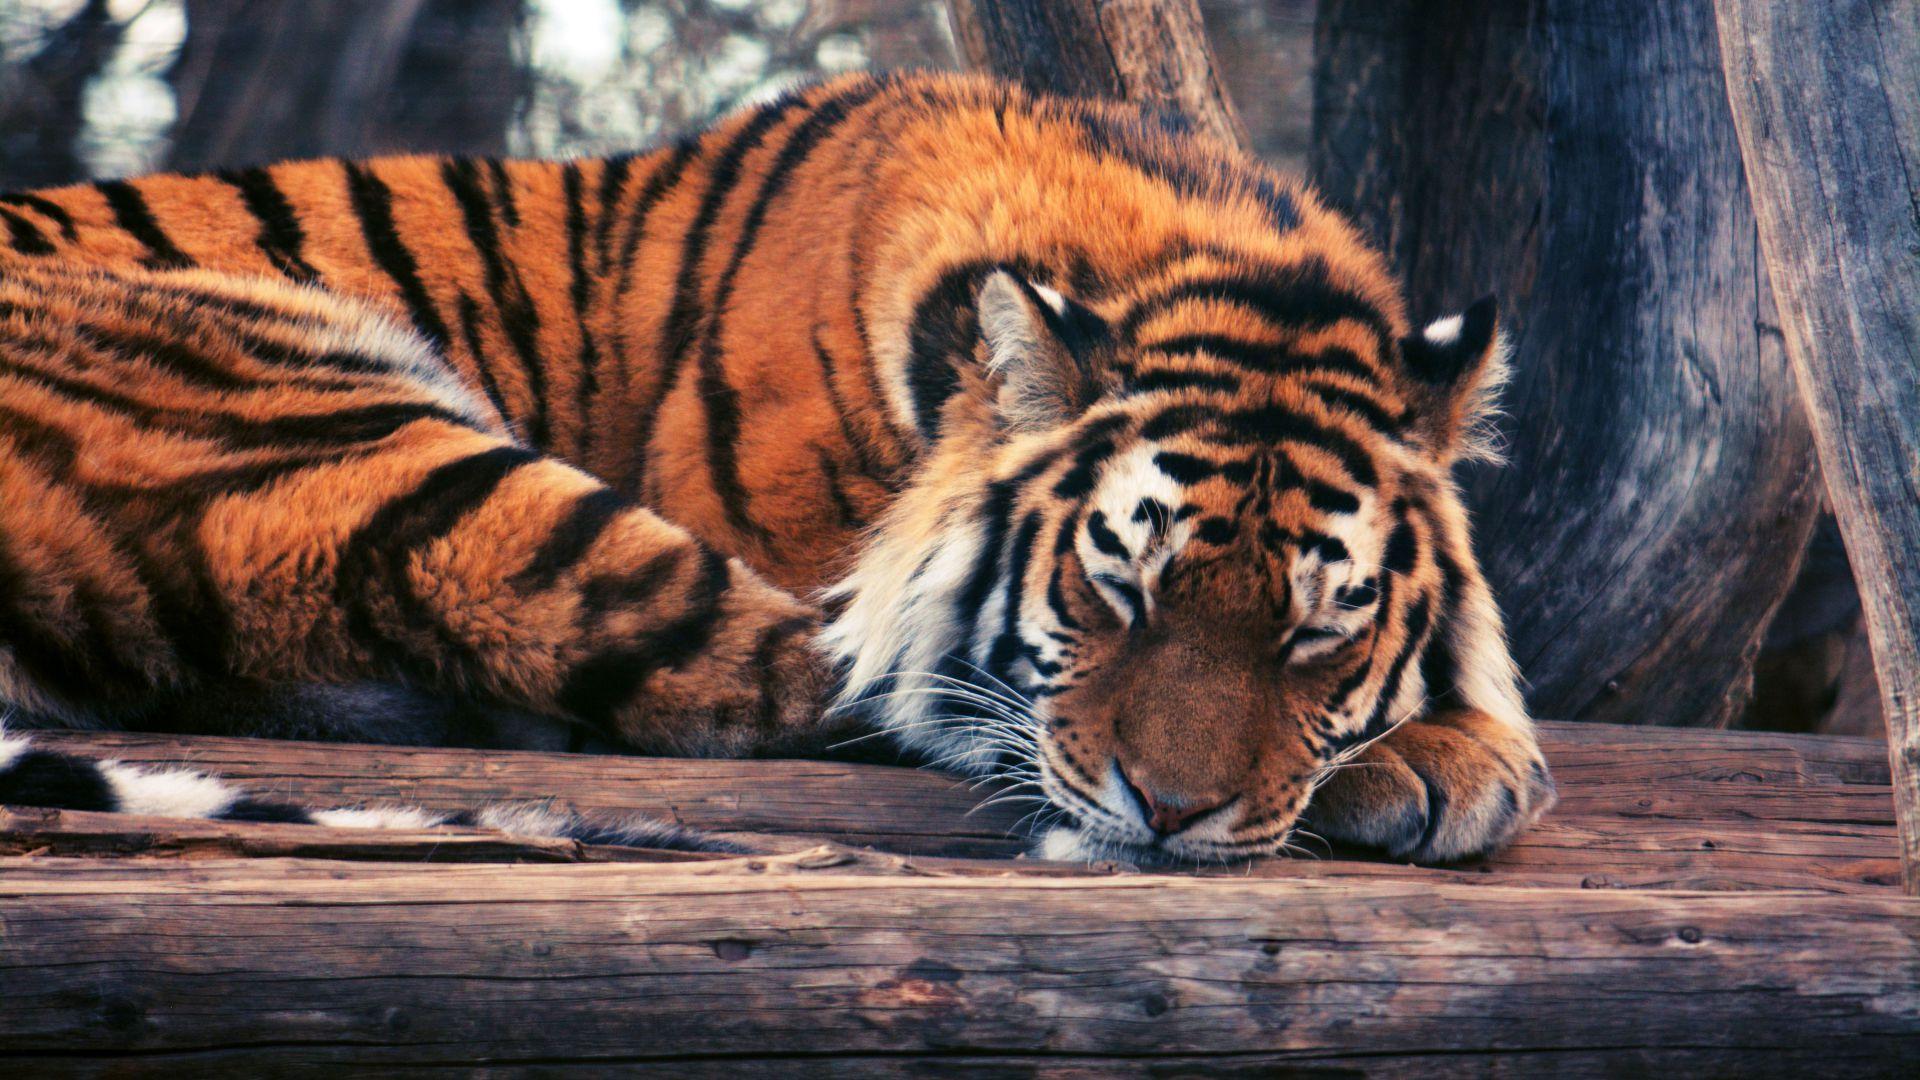 Wallpaper Tiger, Cute Animals, Funny, Animals #4740